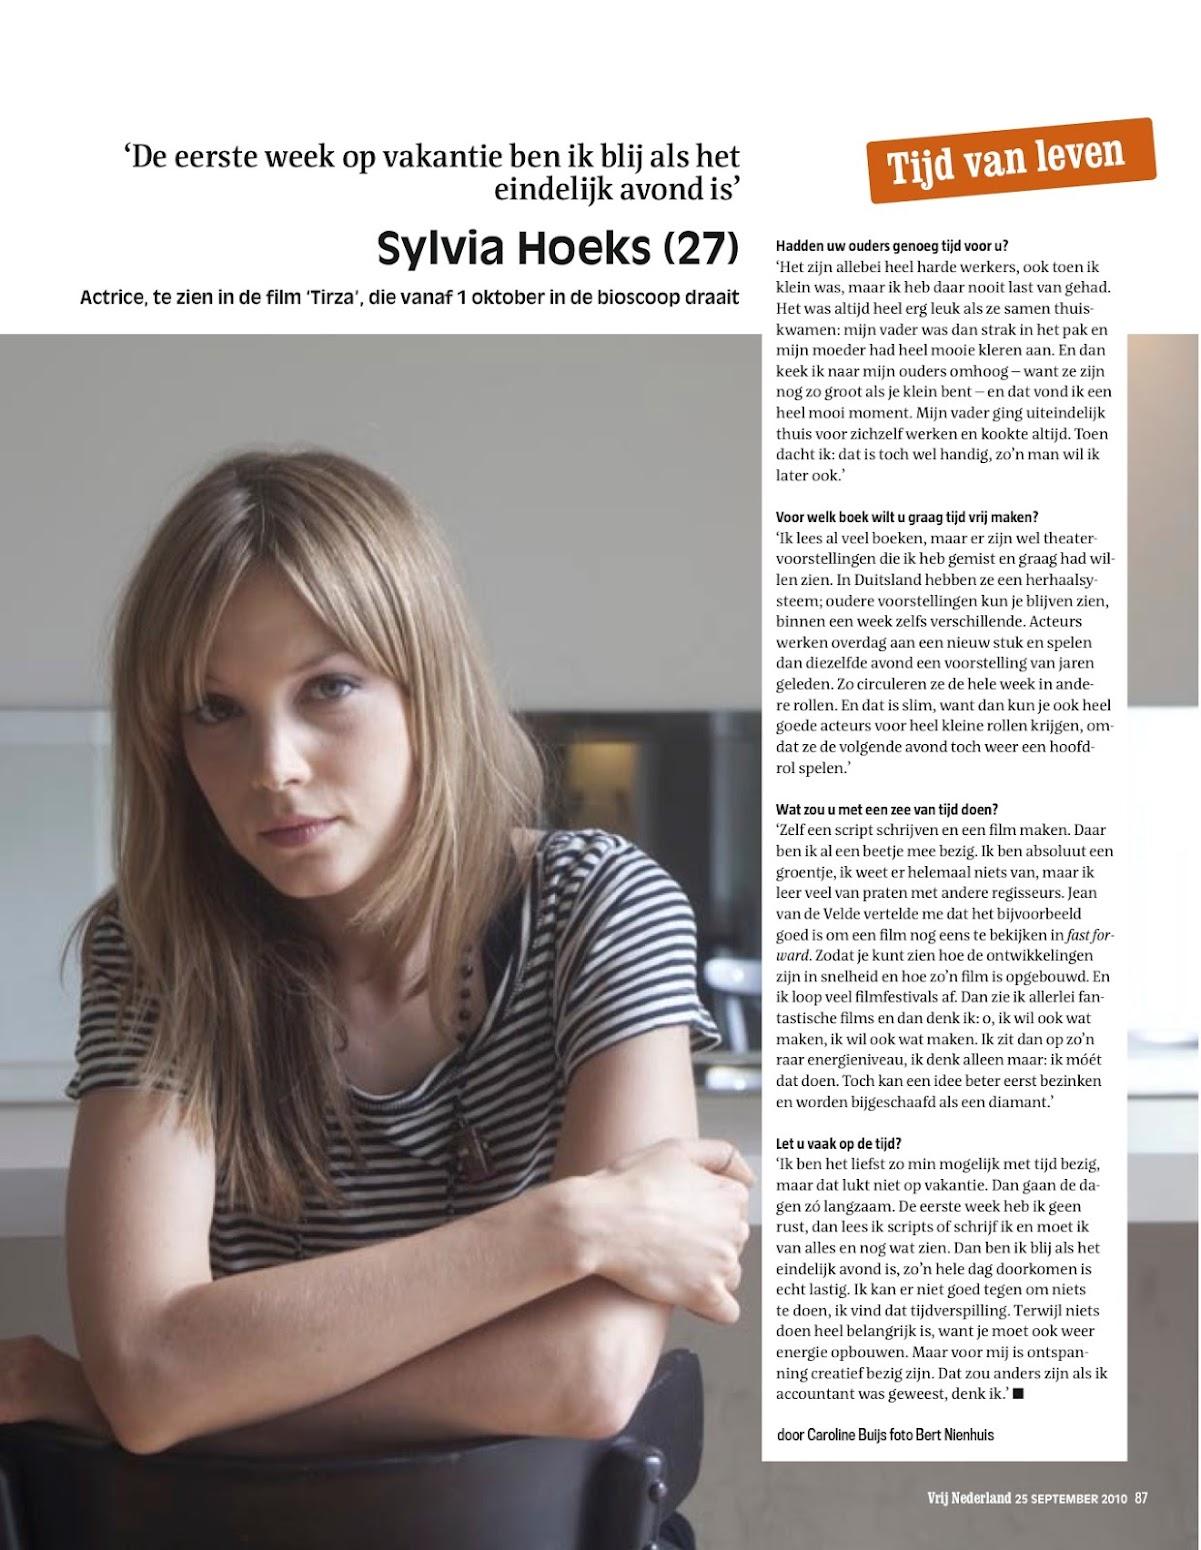 http://1.bp.blogspot.com/-jHkMaXYe5PU/TwGEmTlOJ-I/AAAAAAAABjc/ycXAlkVTNfA/s1550/Leven+Tijd+van+leven_Sylvia.jpg